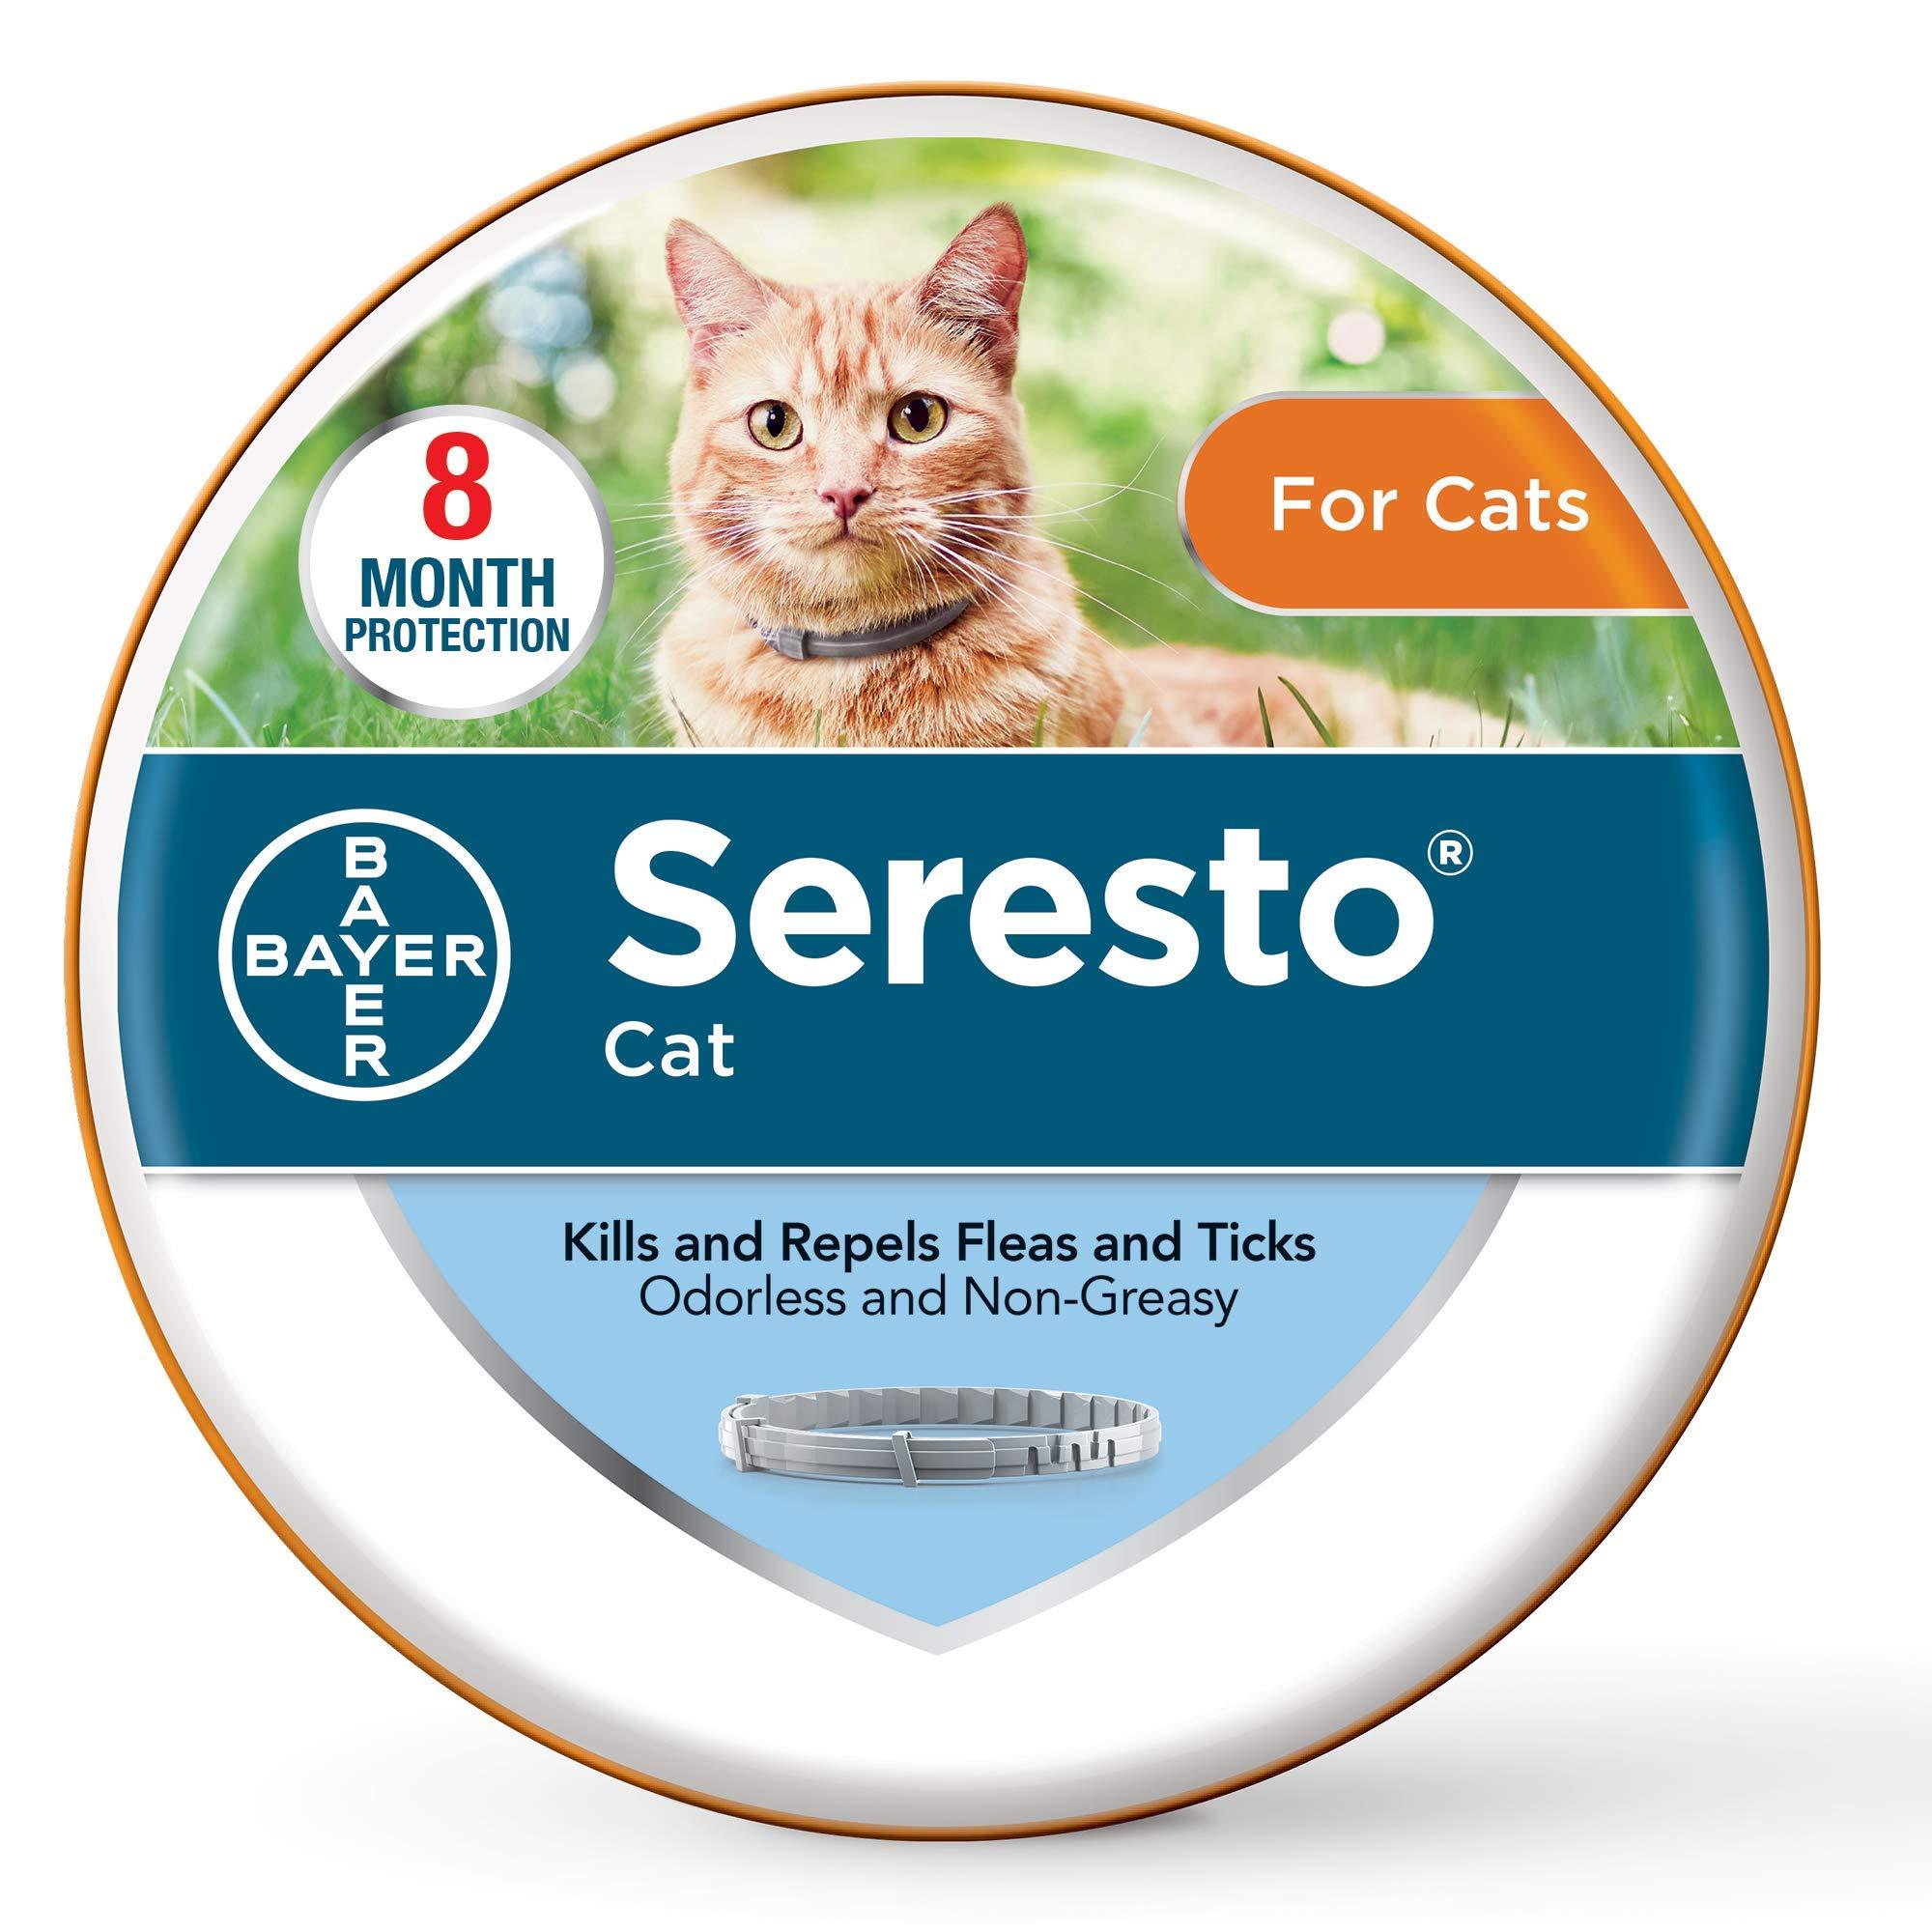 Seresto Flea and Tick Prevention for Cats, 8-Month Flea Collar for Cats